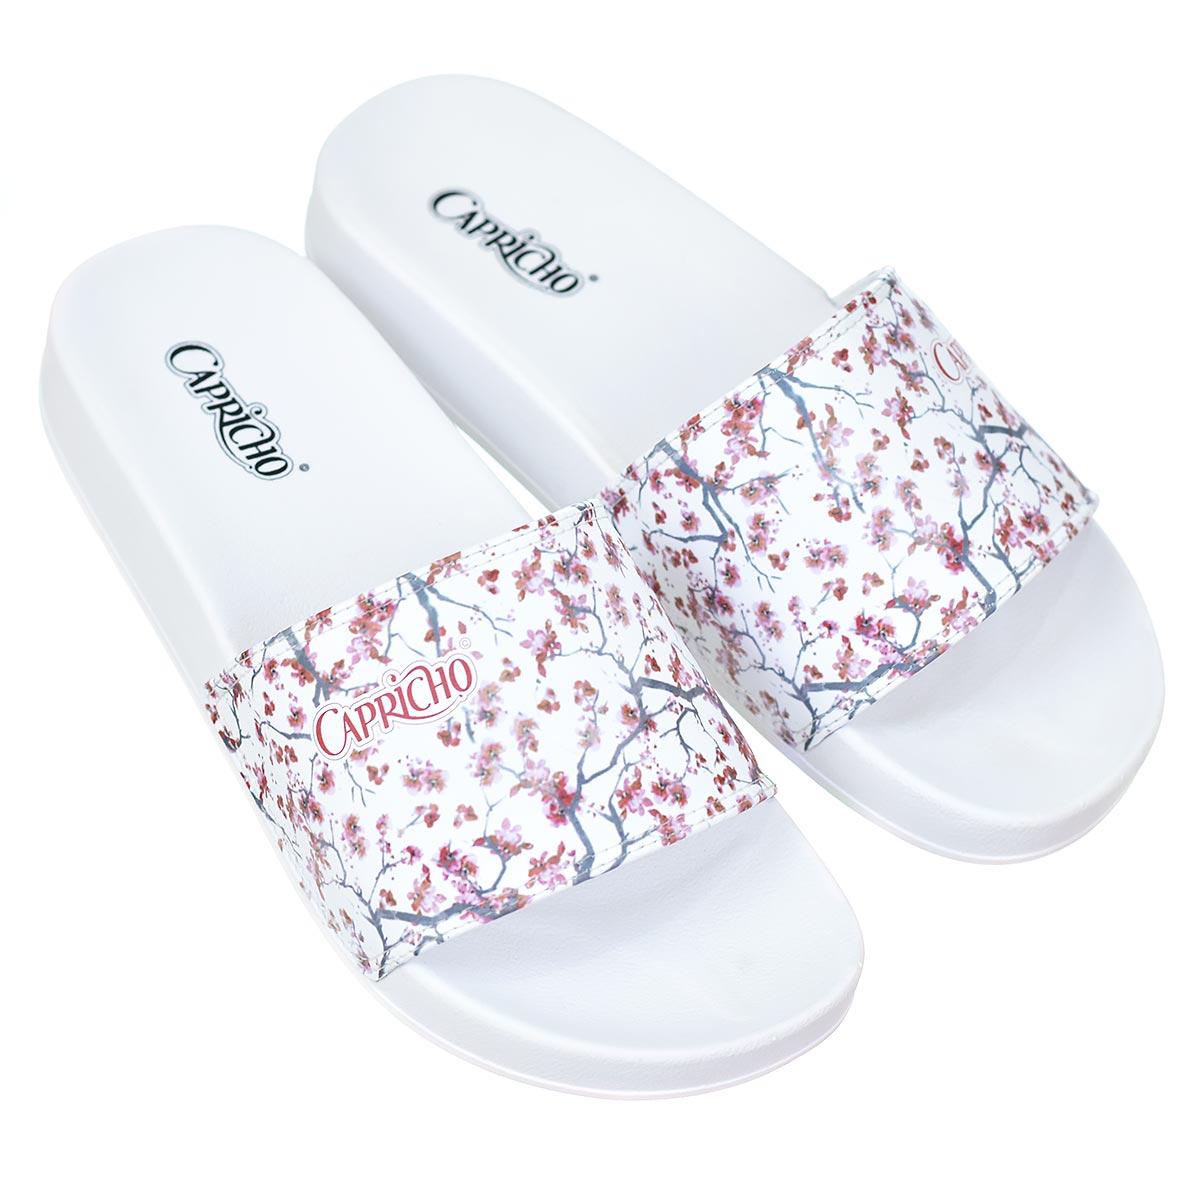 Chinelo Capricho Slide Cherry Blossom